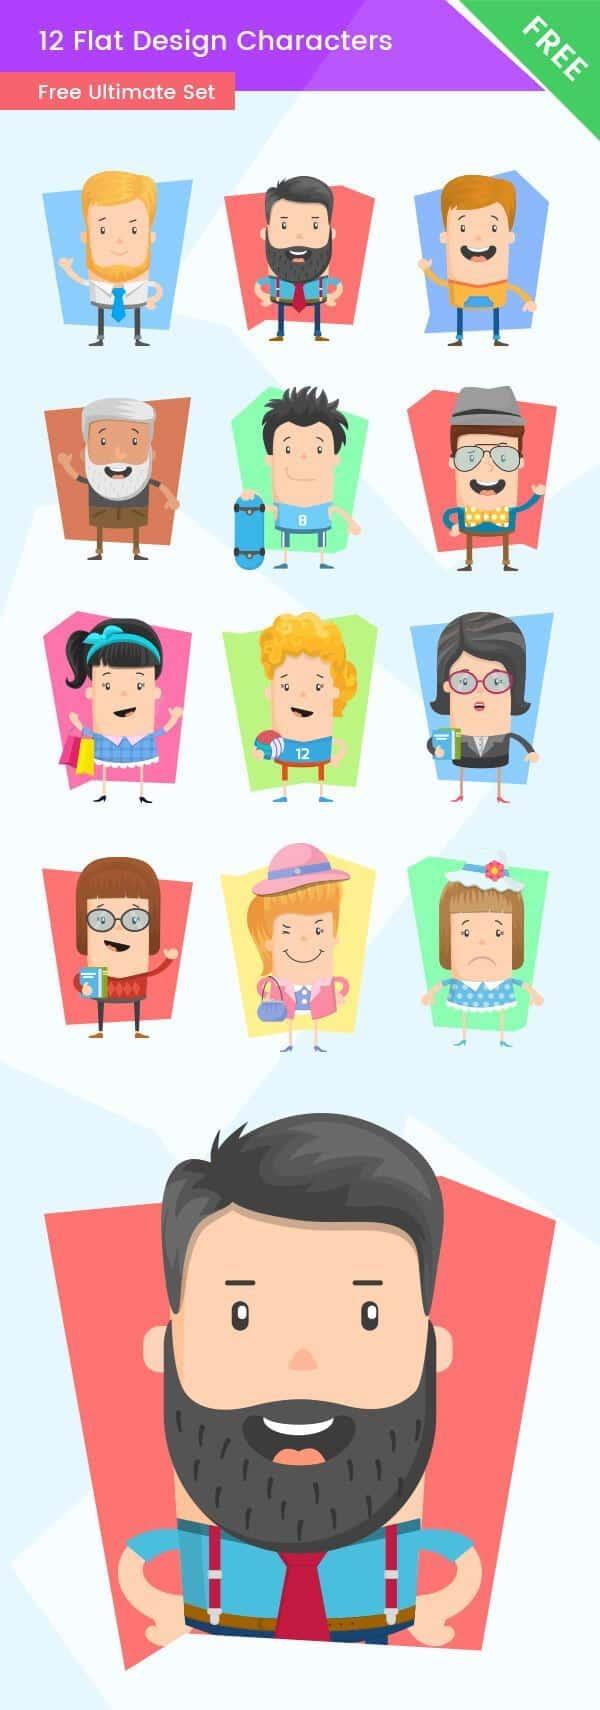 Free Flat Design Characters Ultimate Set